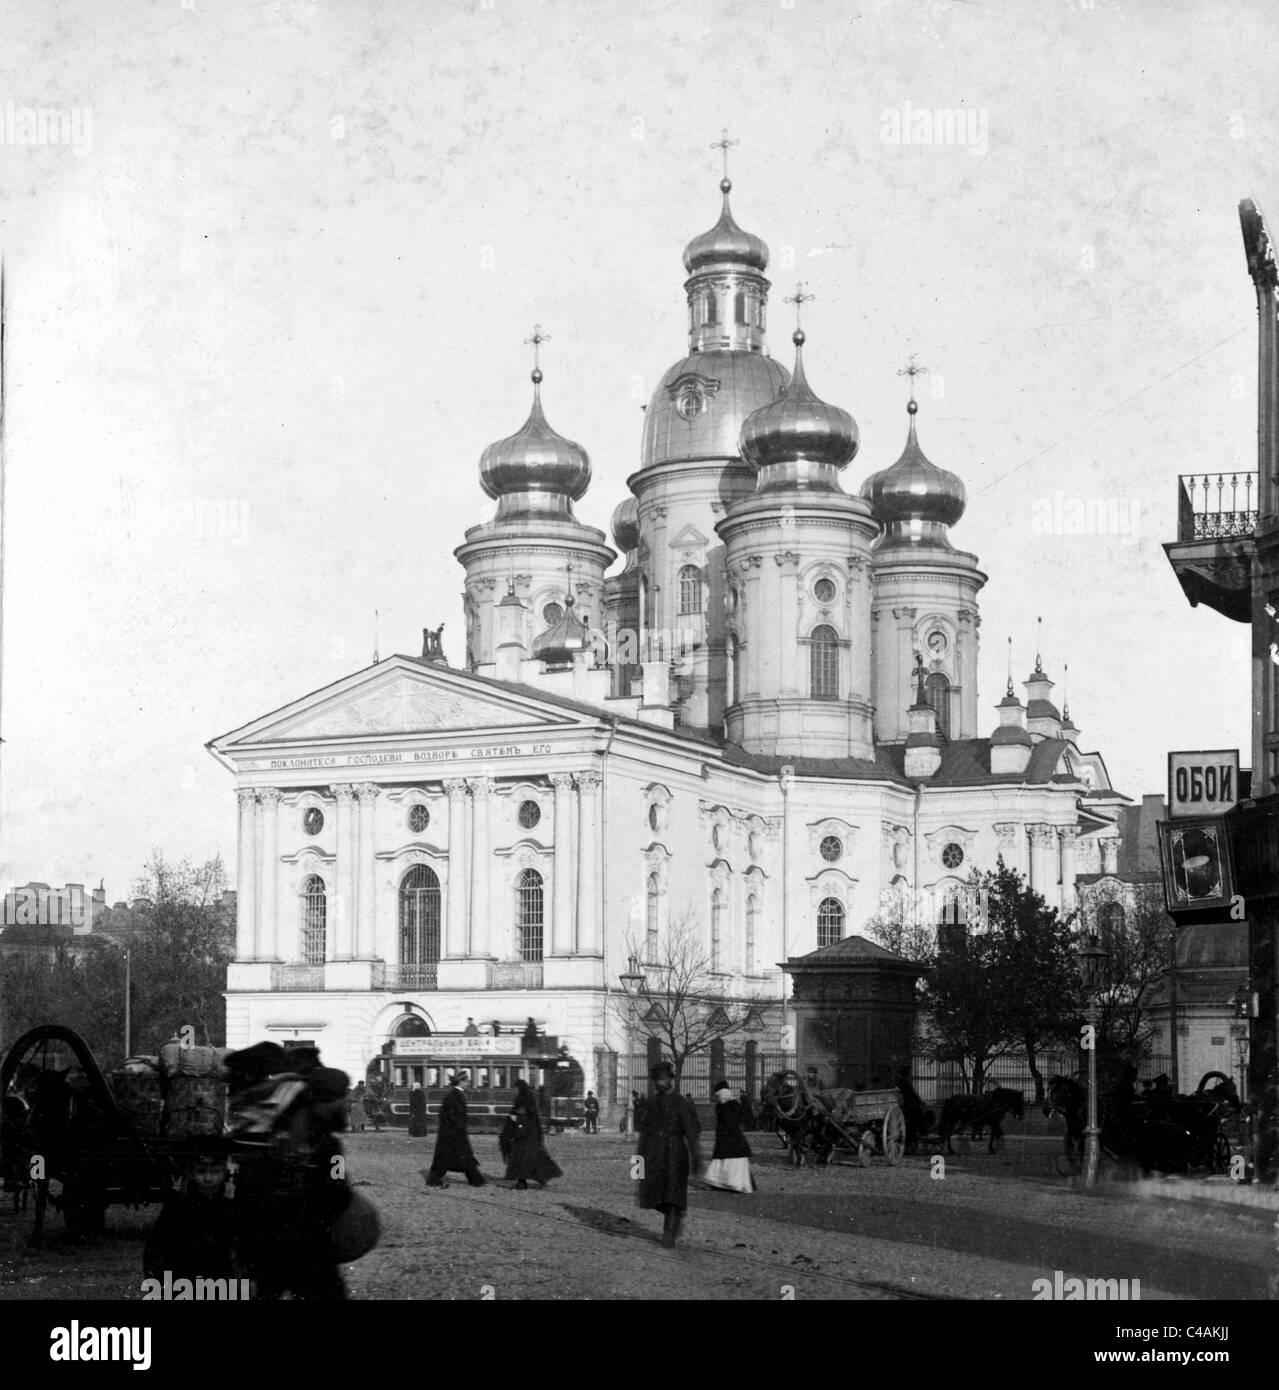 Mosque of St. Vladimir, St. Petersburg, Russia - Stock Image